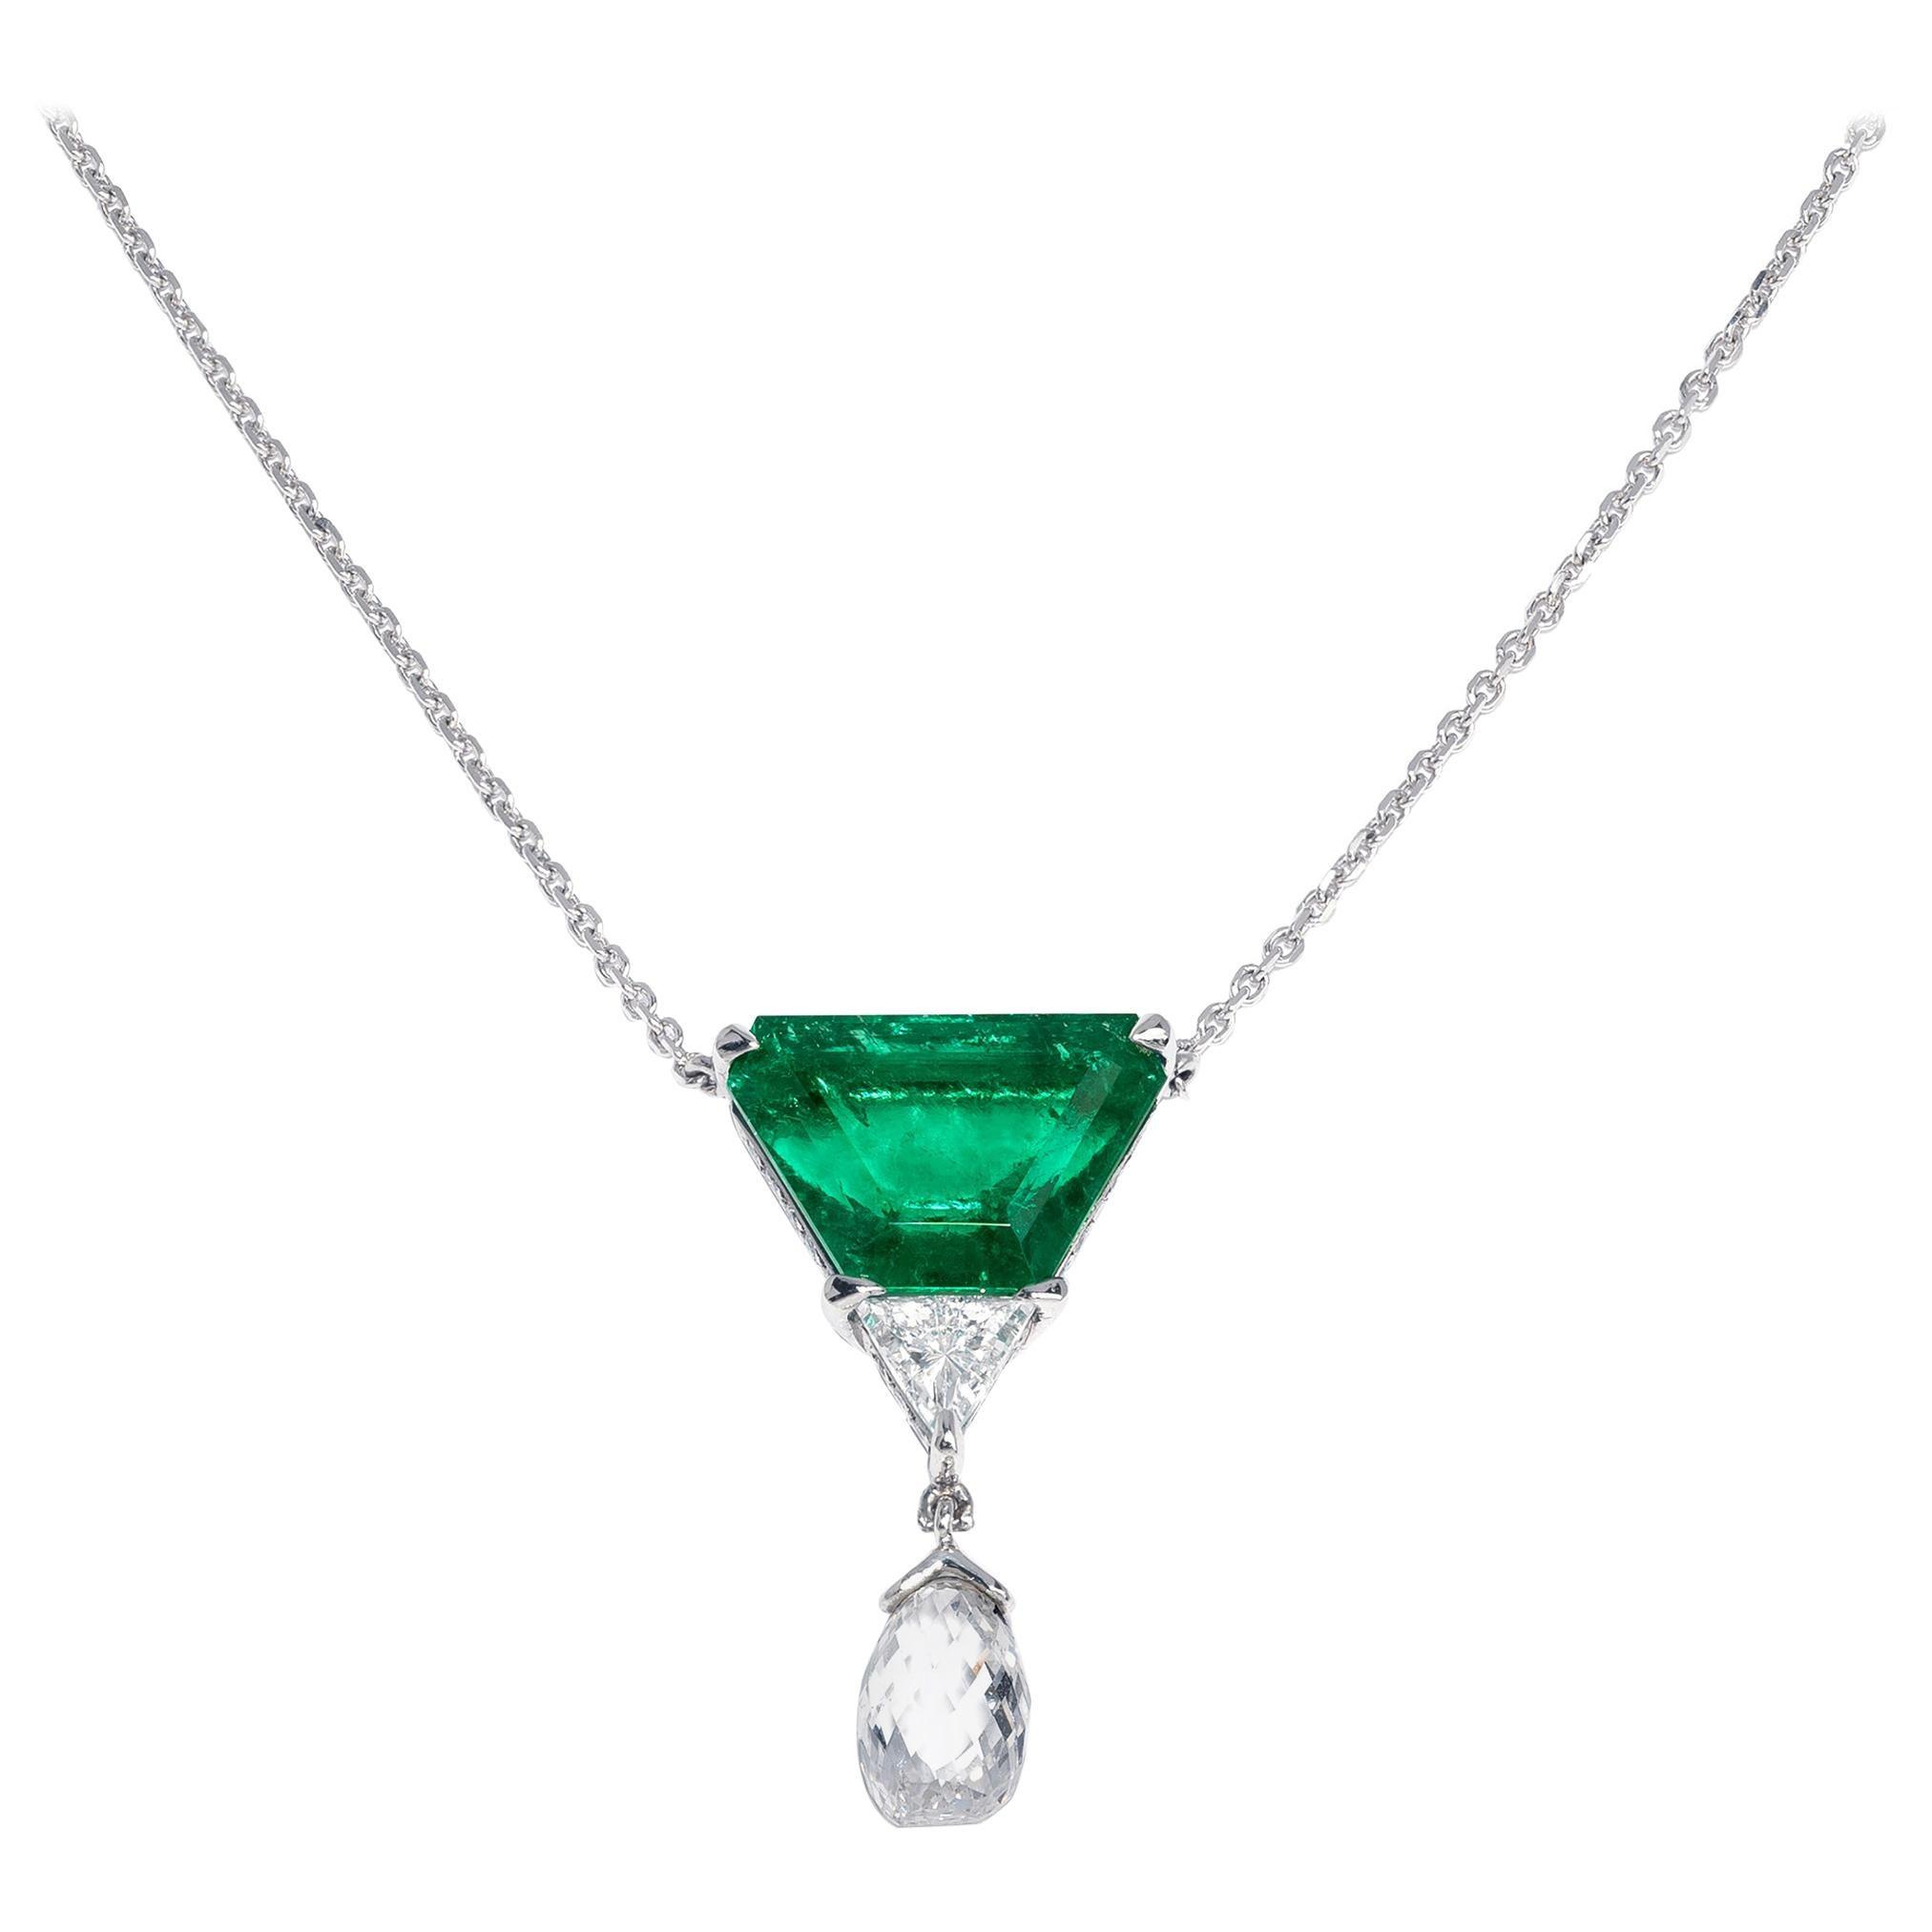 Exquisite 3 Carat Colombian Emerald and Diamond Platinum Necklace